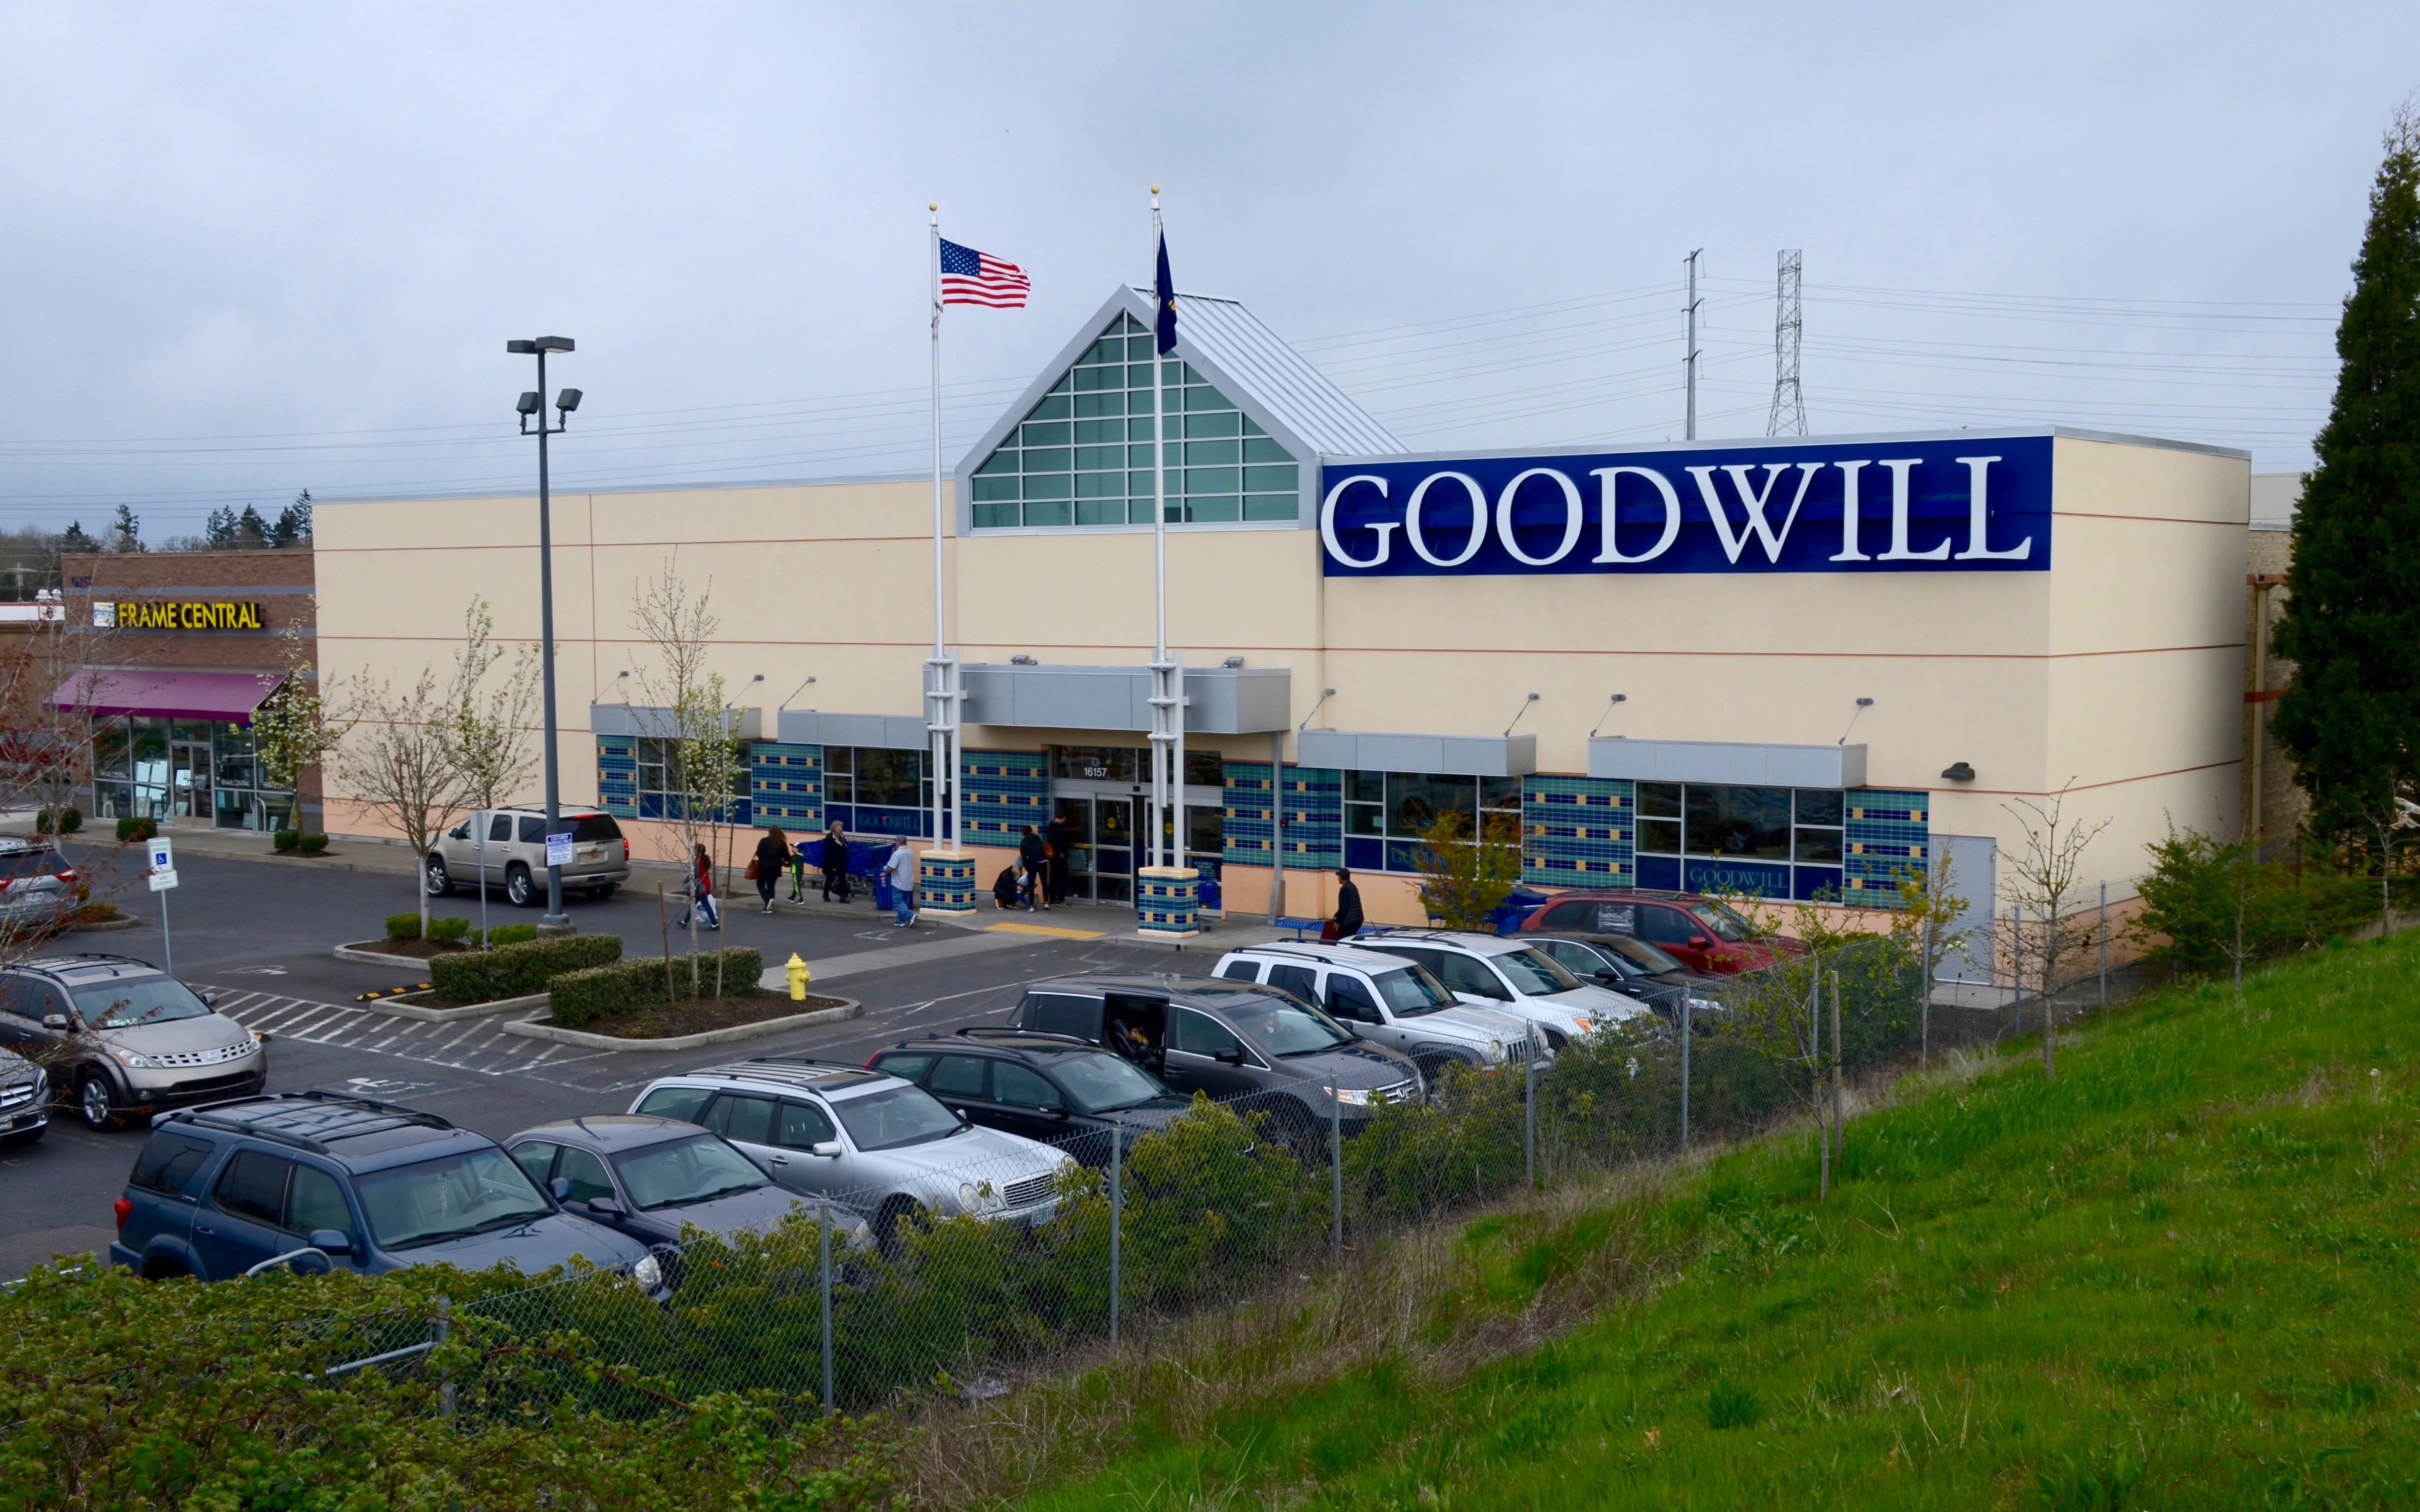 Goodwill LA